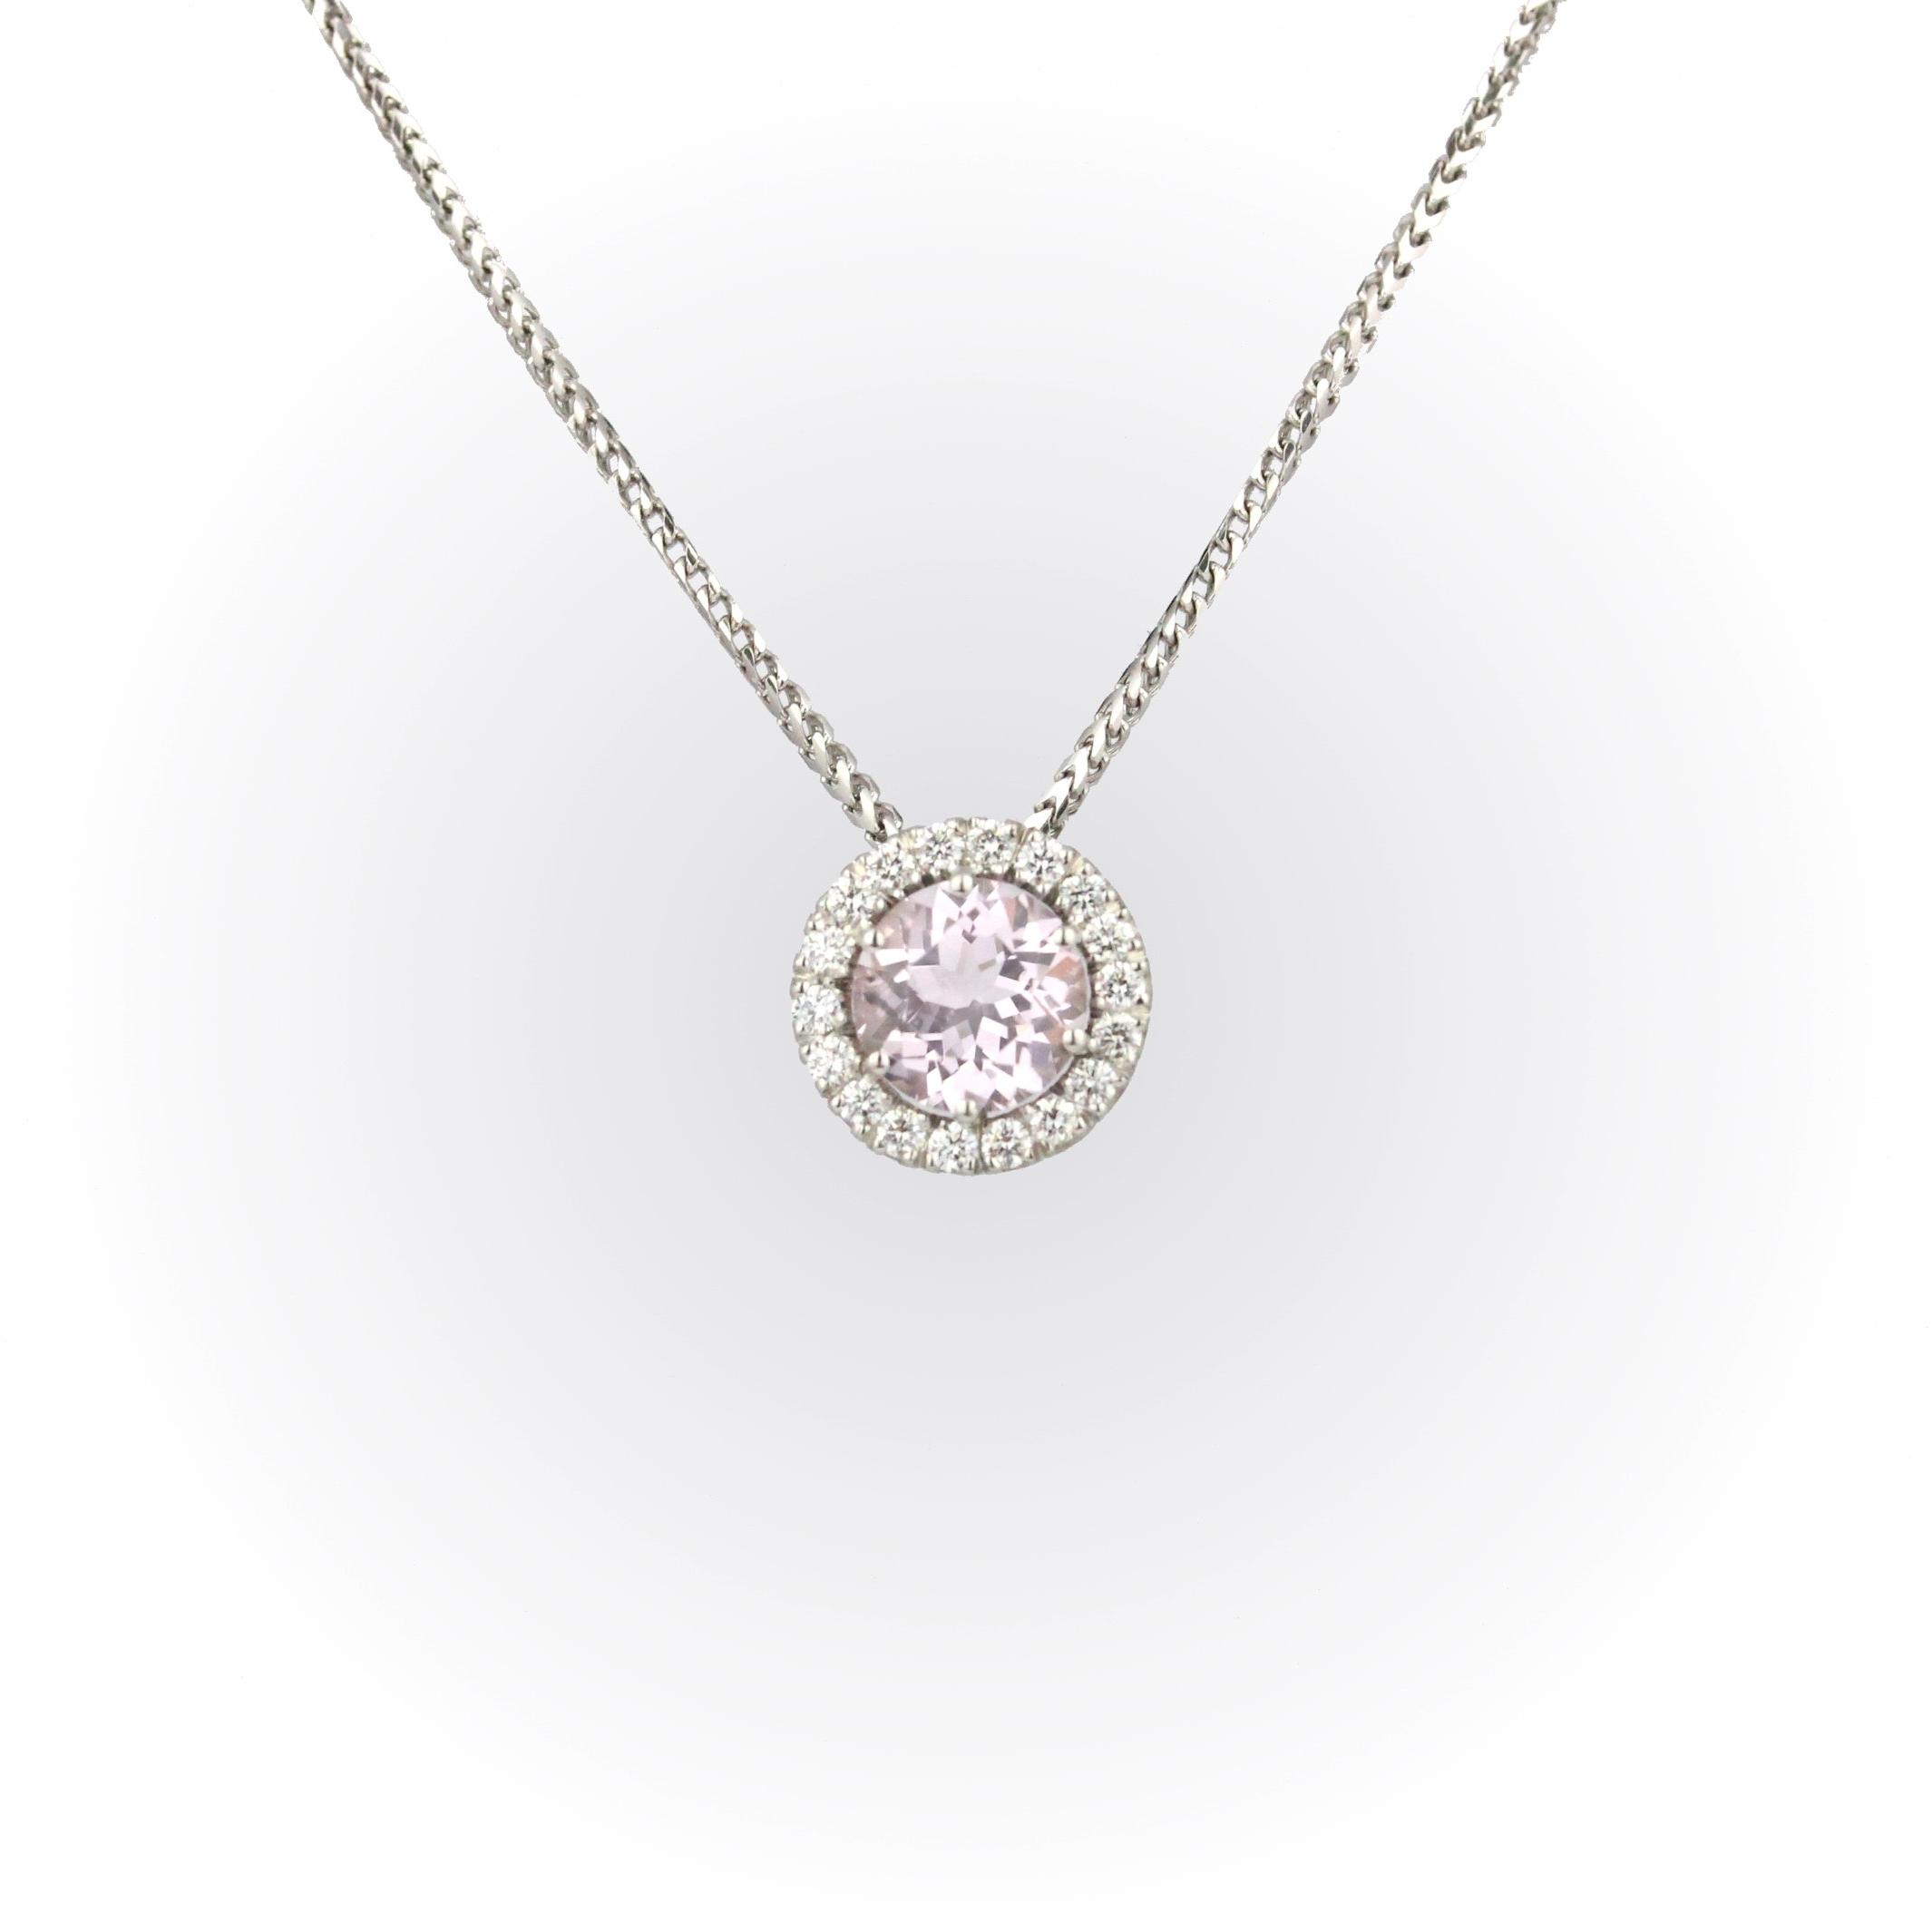 Round morganite with diamond halo pendant set in whtie gold.